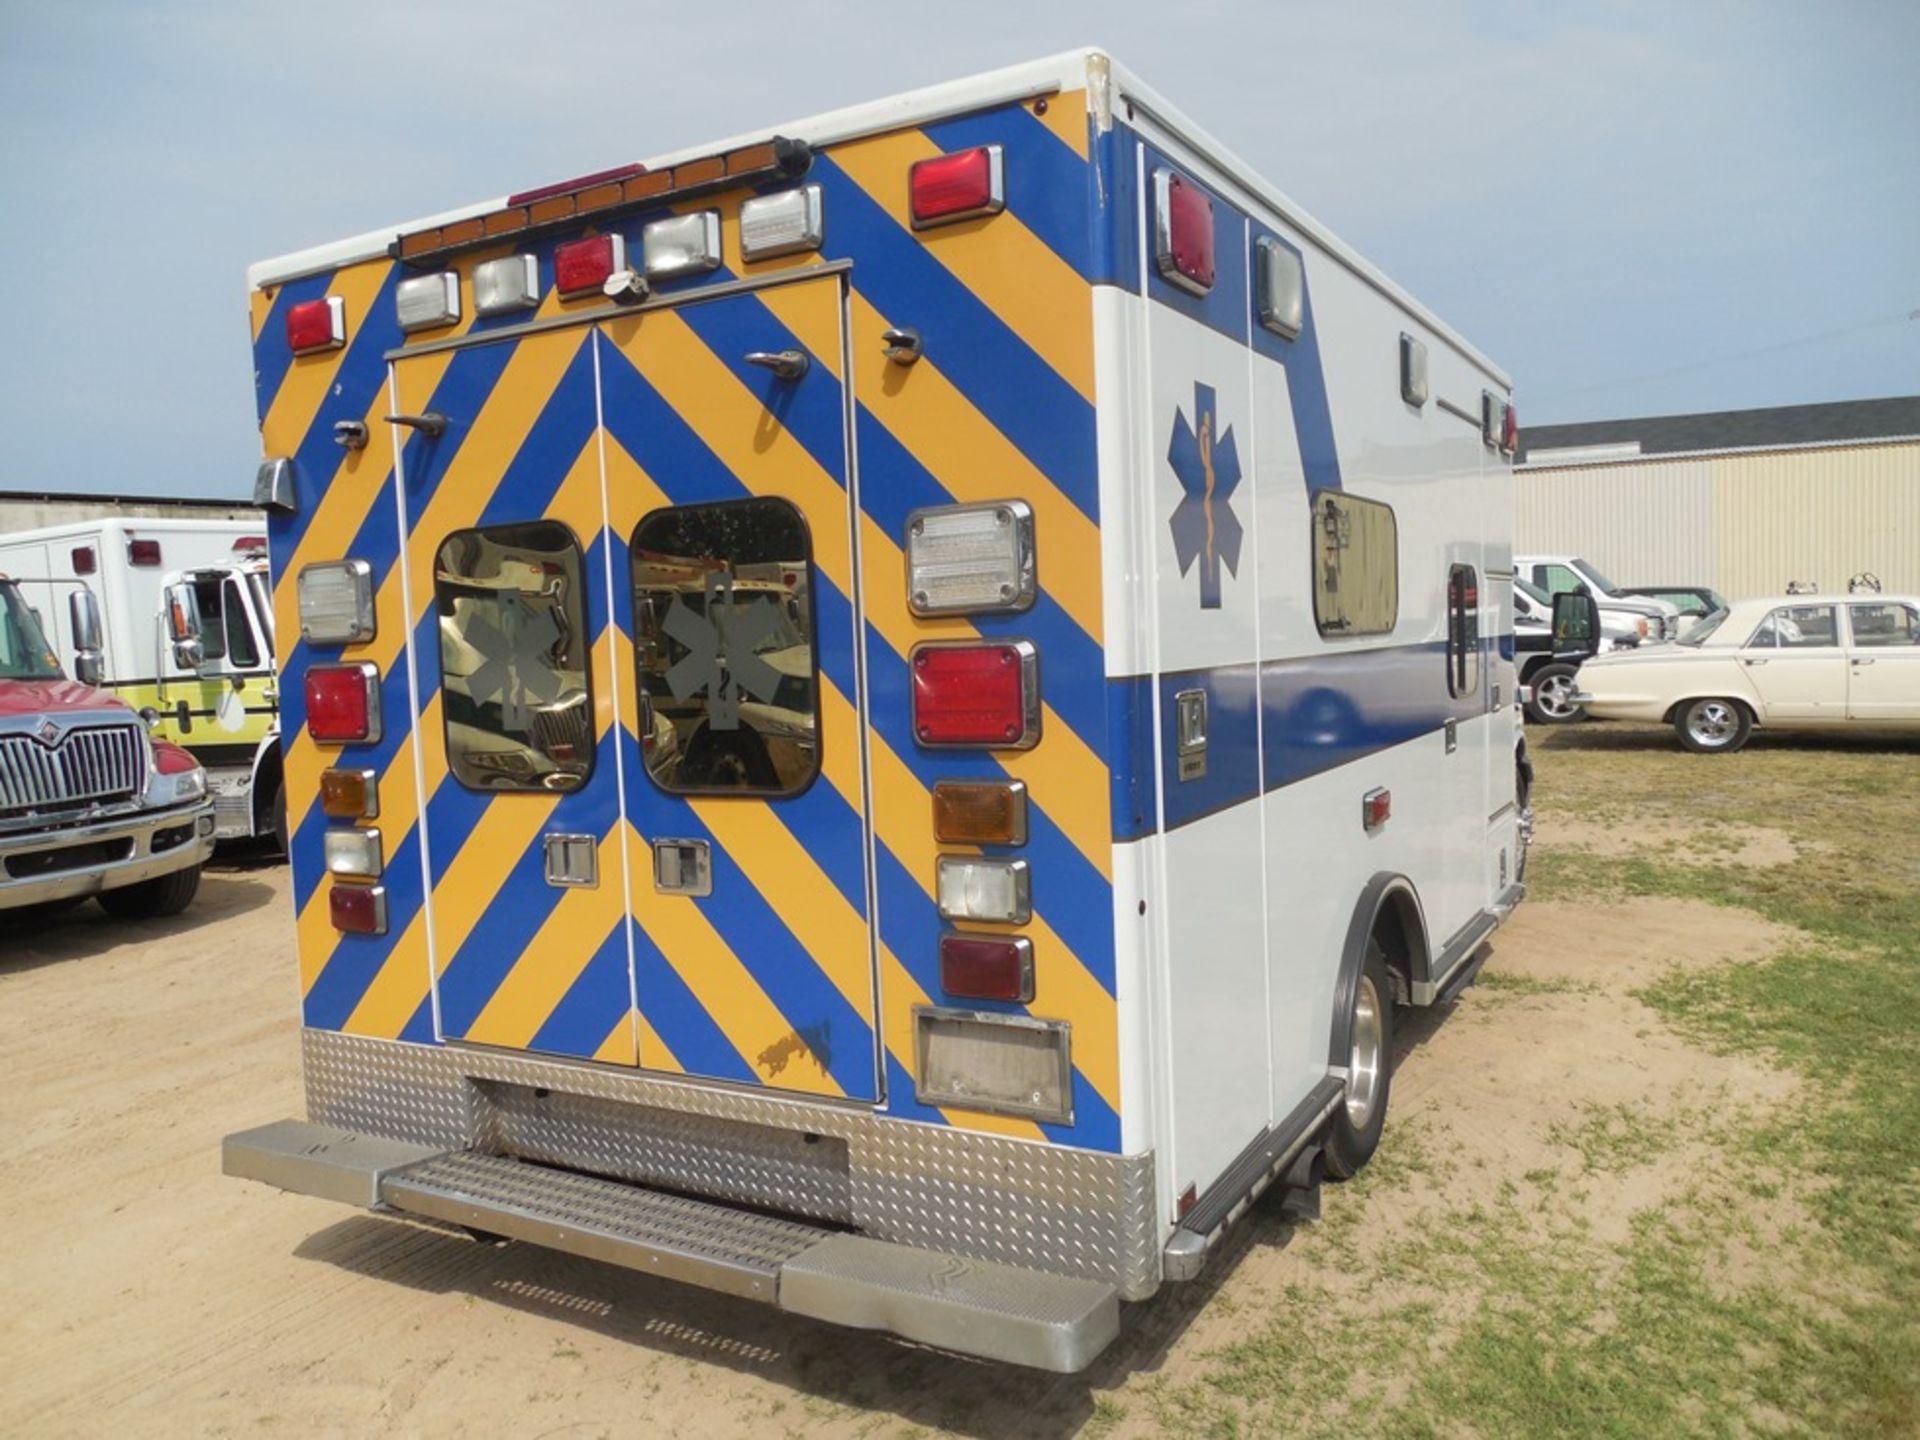 2009 Chev 4500 dsl, box ambulance 226,356 miles vin# 1GBKG316191158061 - Image 4 of 6